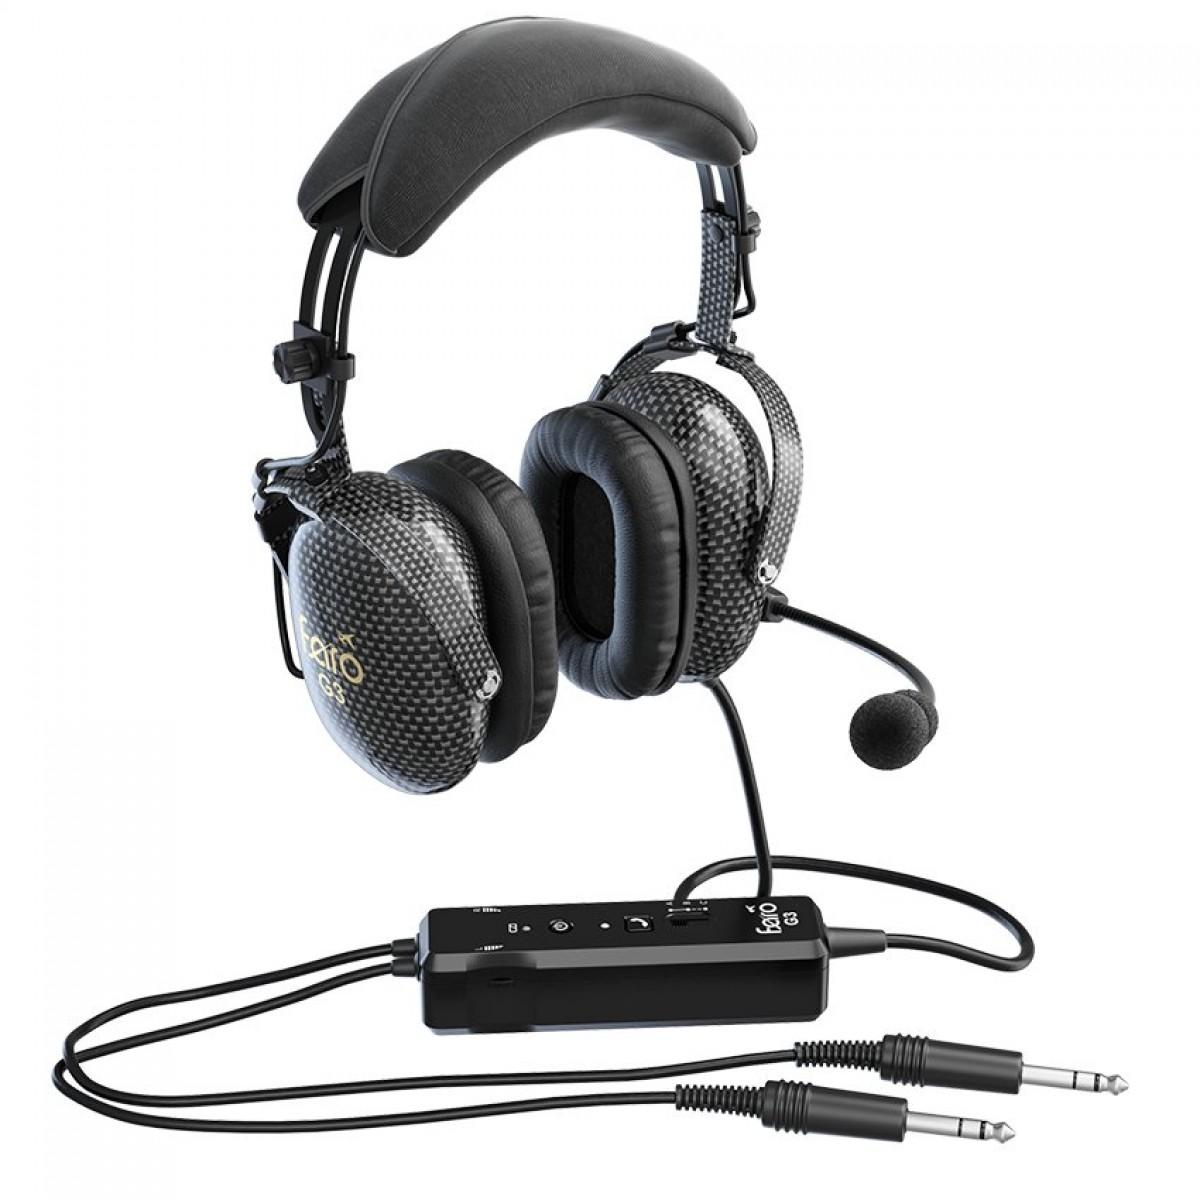 faro g3 anr pilot headset with bluetooth mypilotstore com